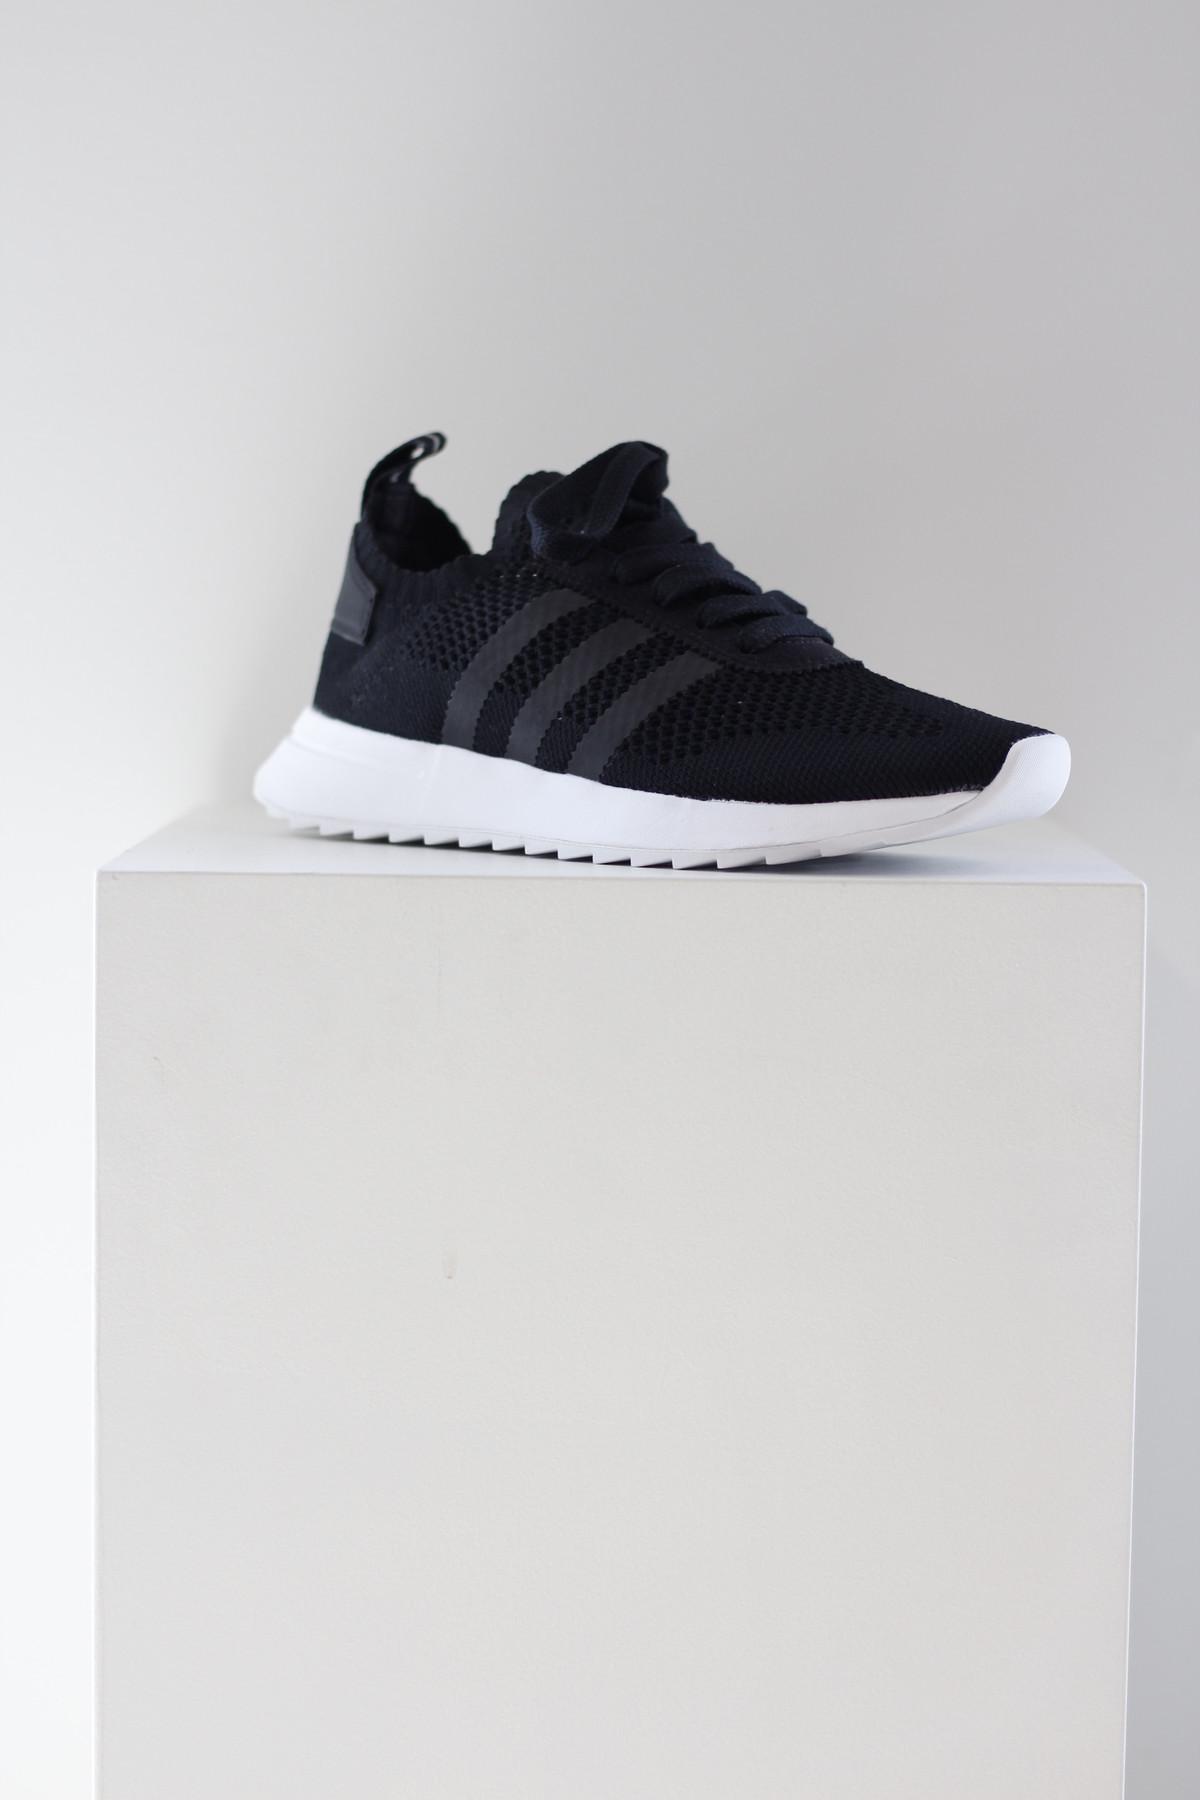 1095bcc8f2b626 Adidas flashback sneaker